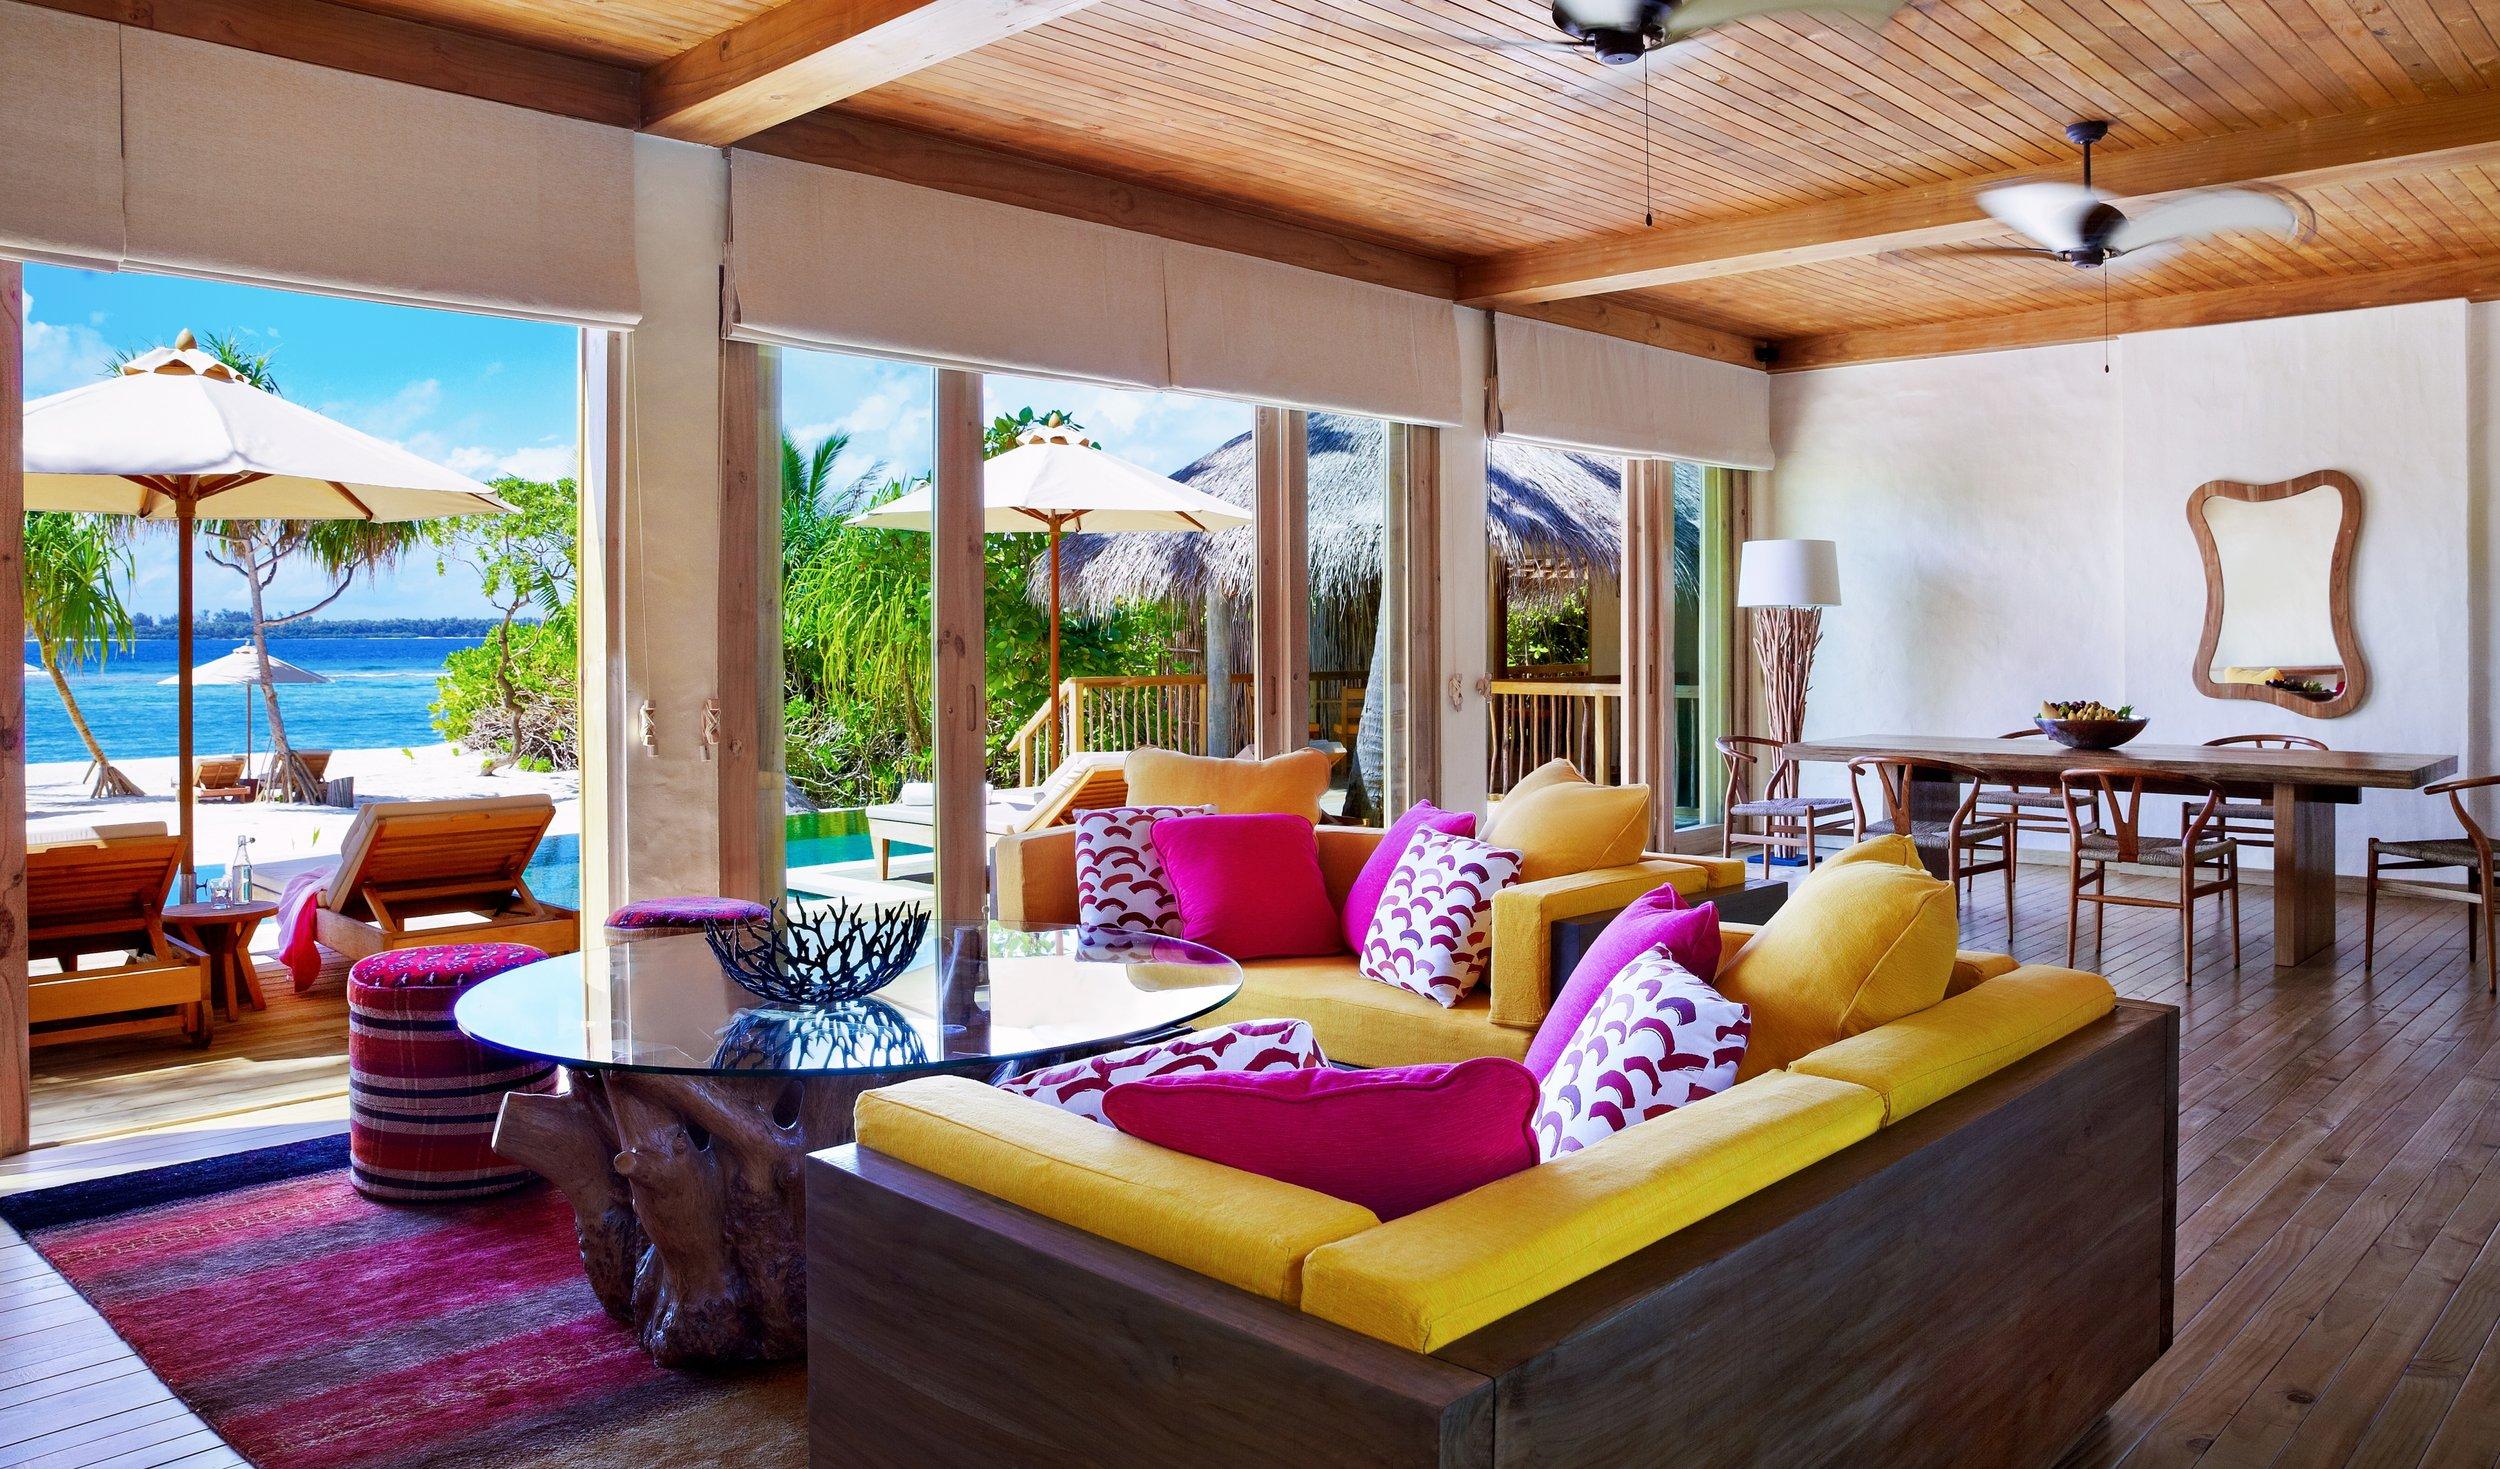 Two_Bedroom_Ocean_Beach_Villa_with_Pool_living_room_[6044-A4].jpg